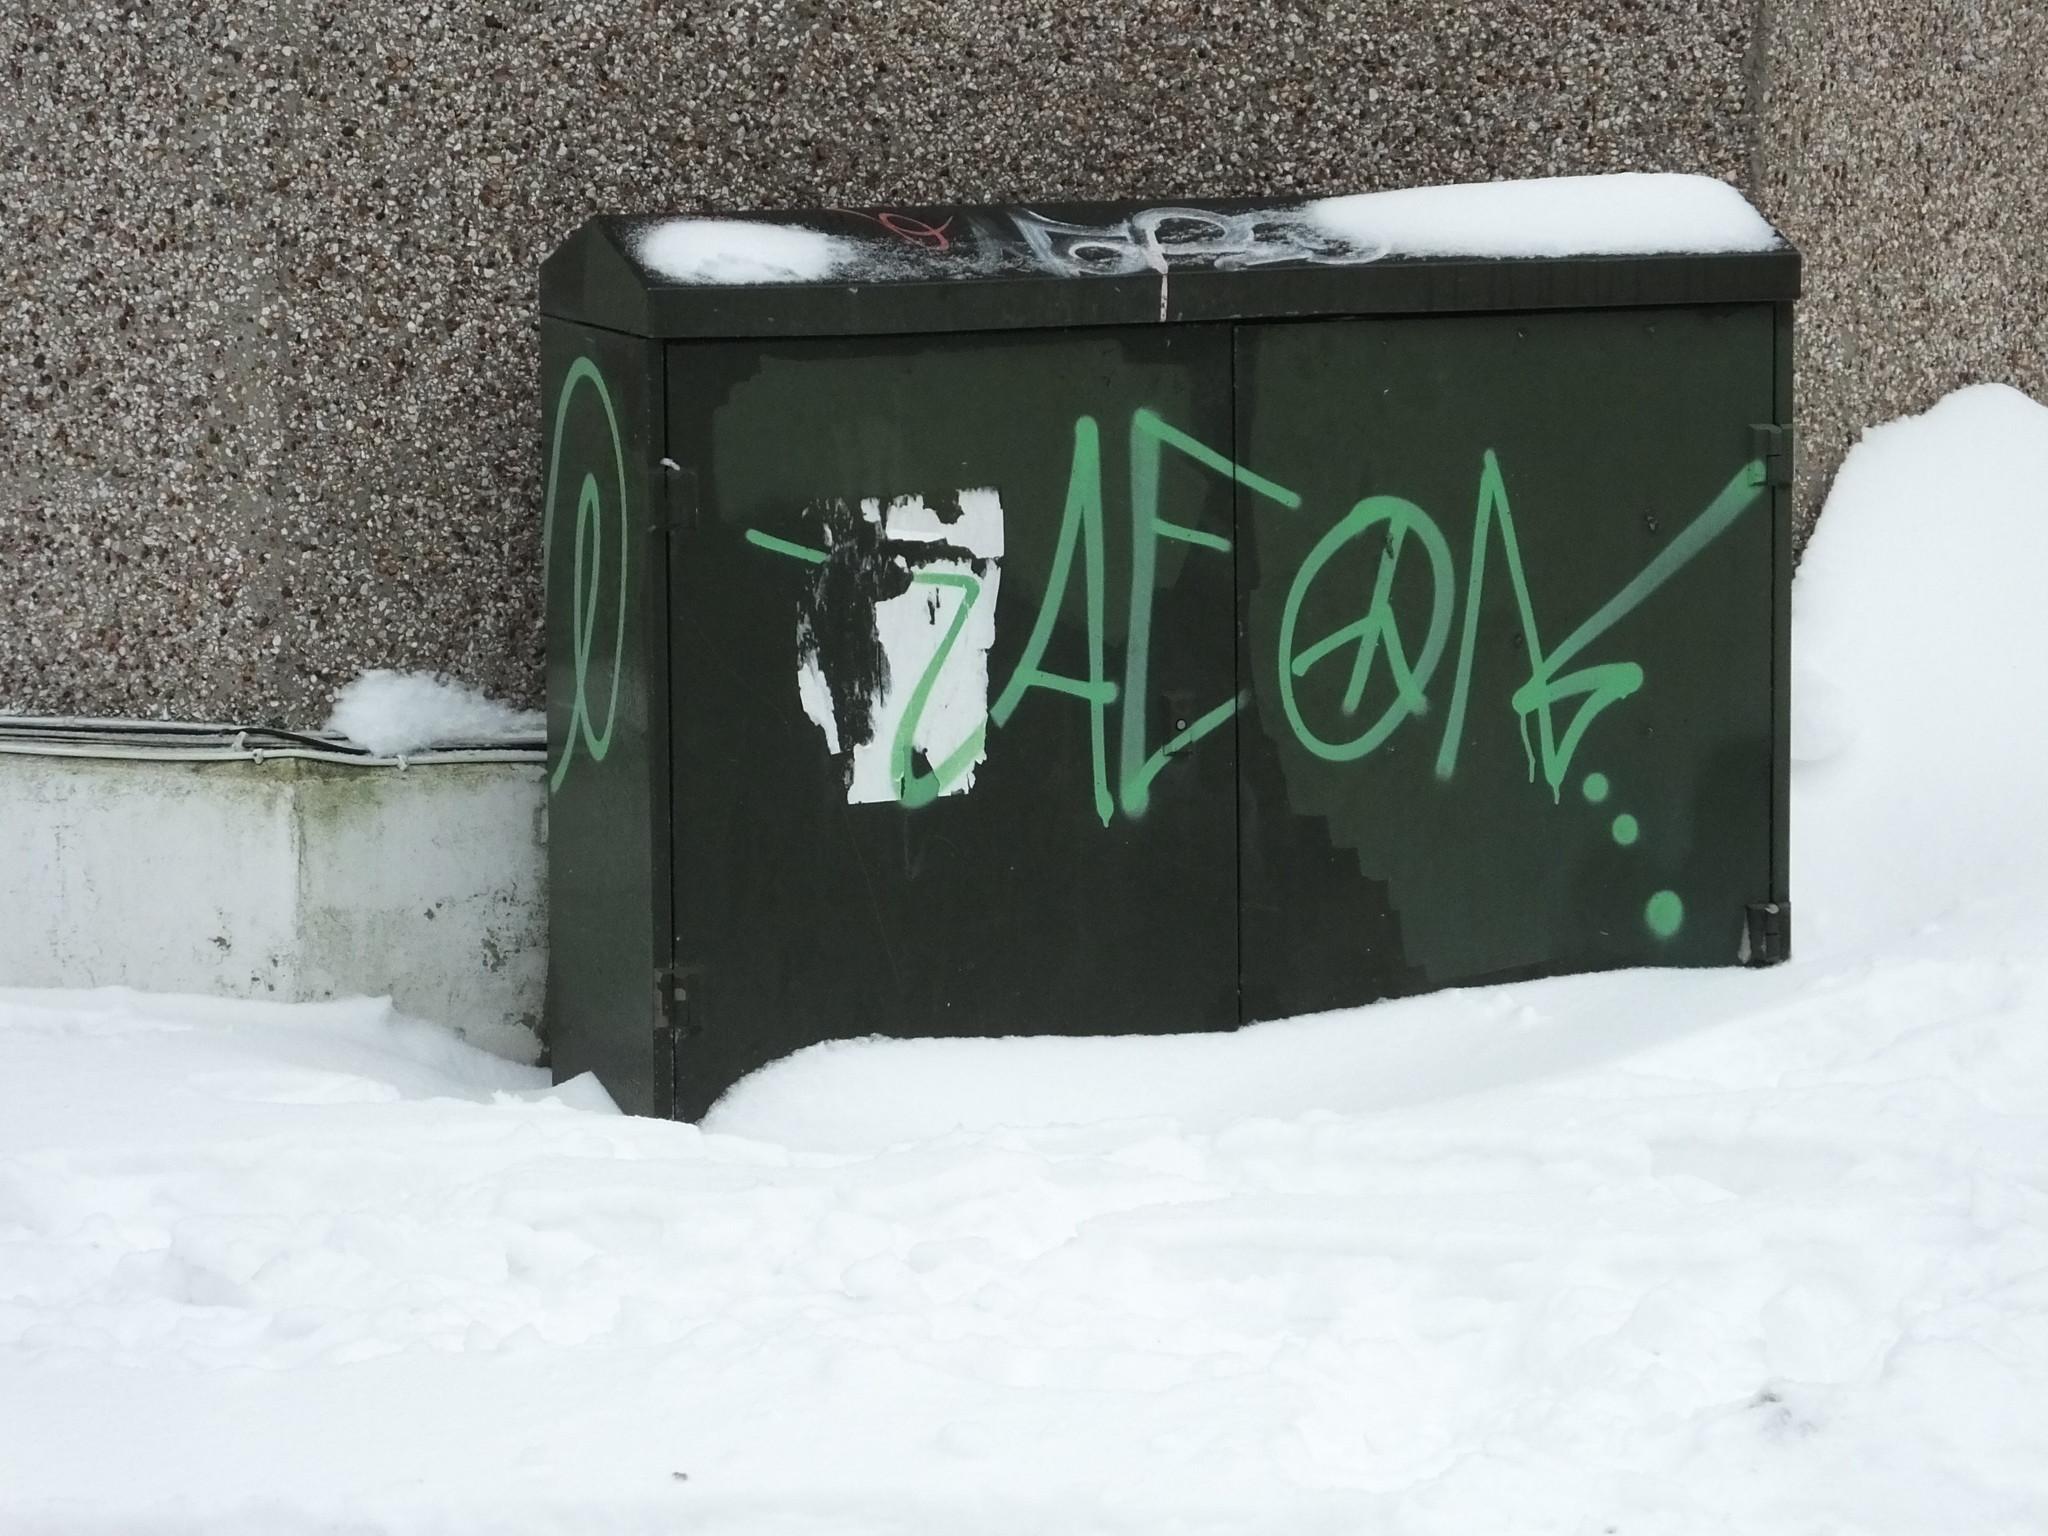 Cardiff Snow